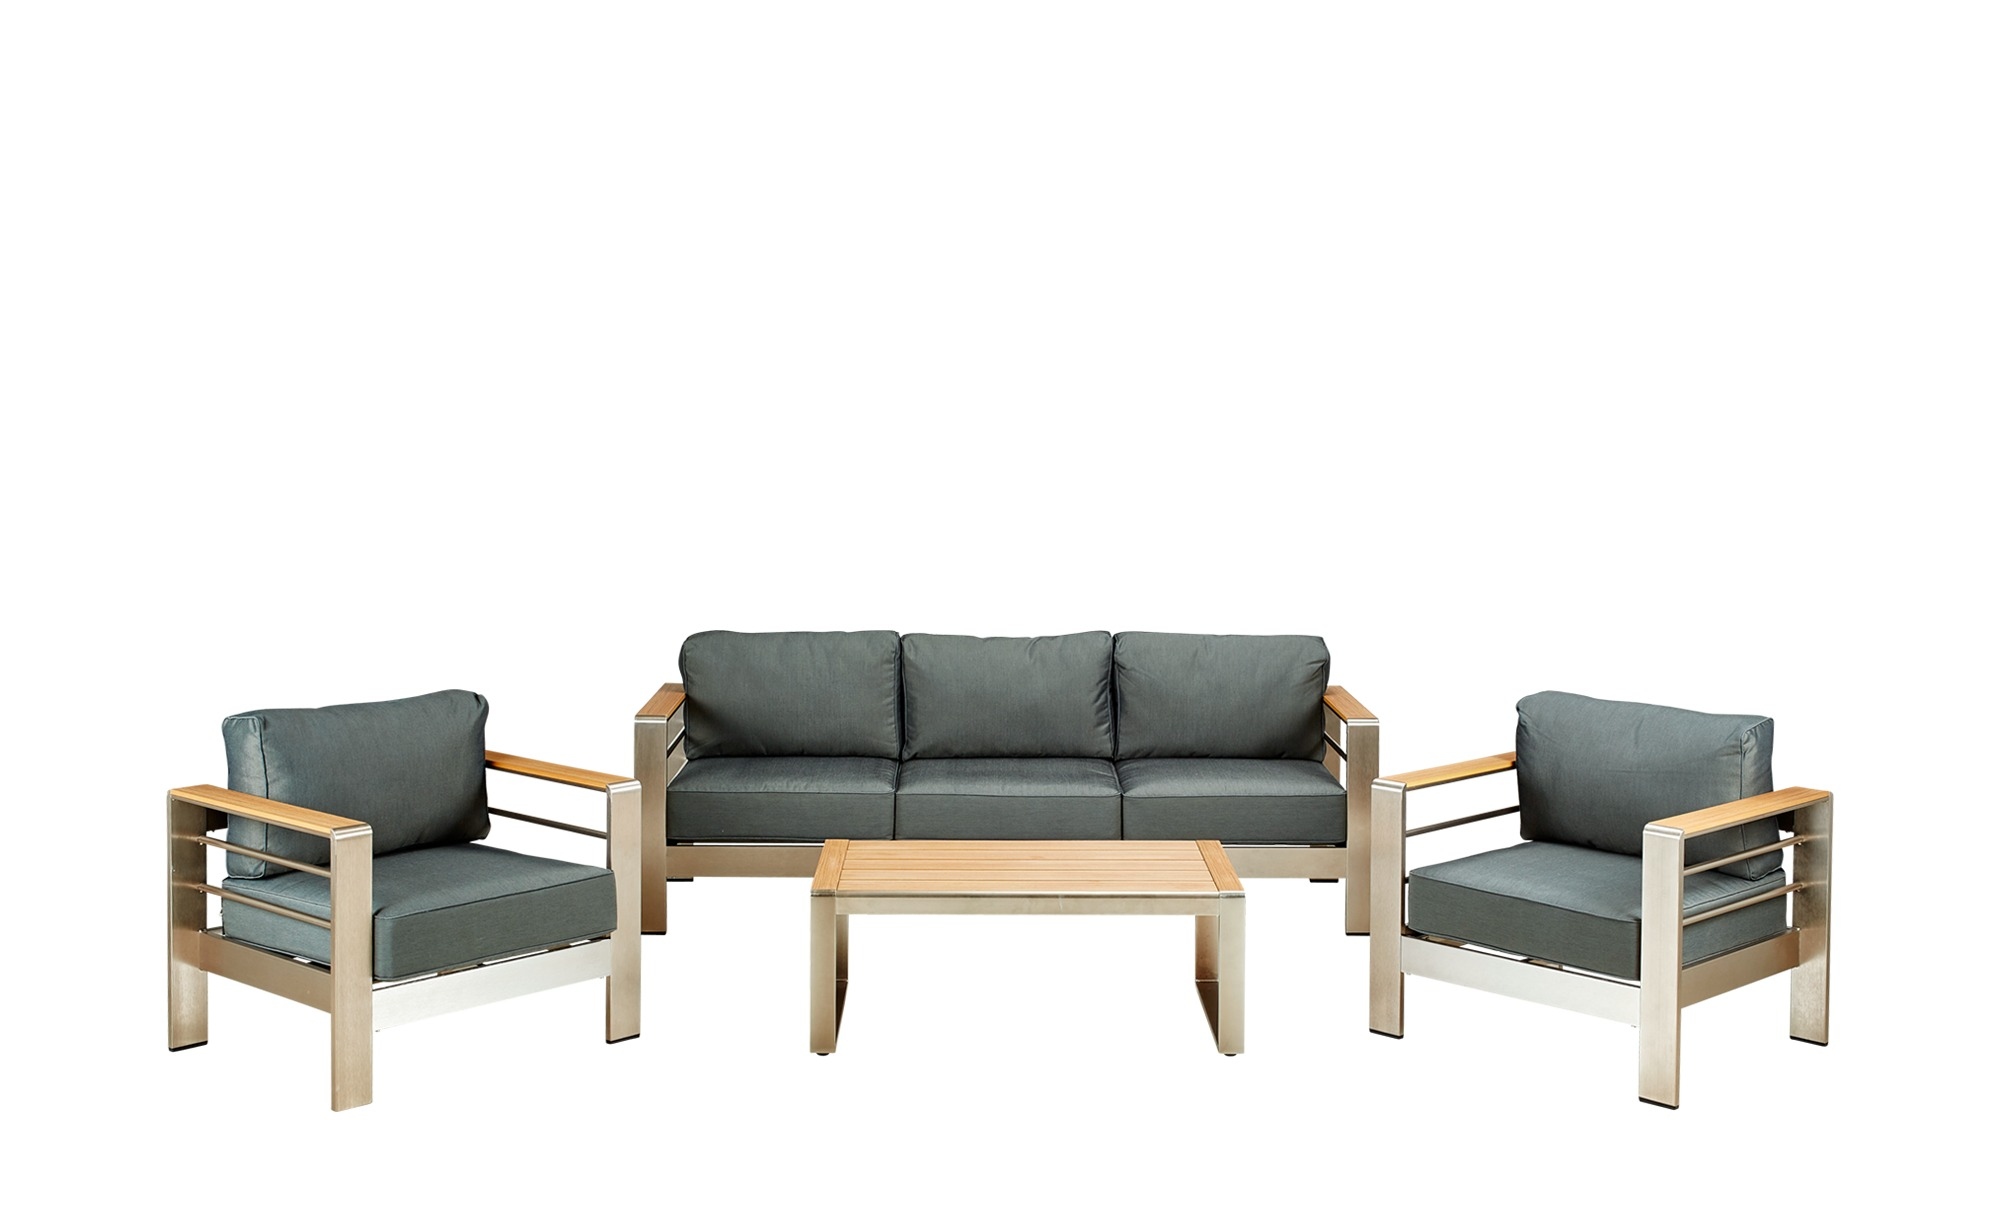 a casa mia Outdoor-Lounge-Sitzgruppe New YorkgrauMaterialmix ...